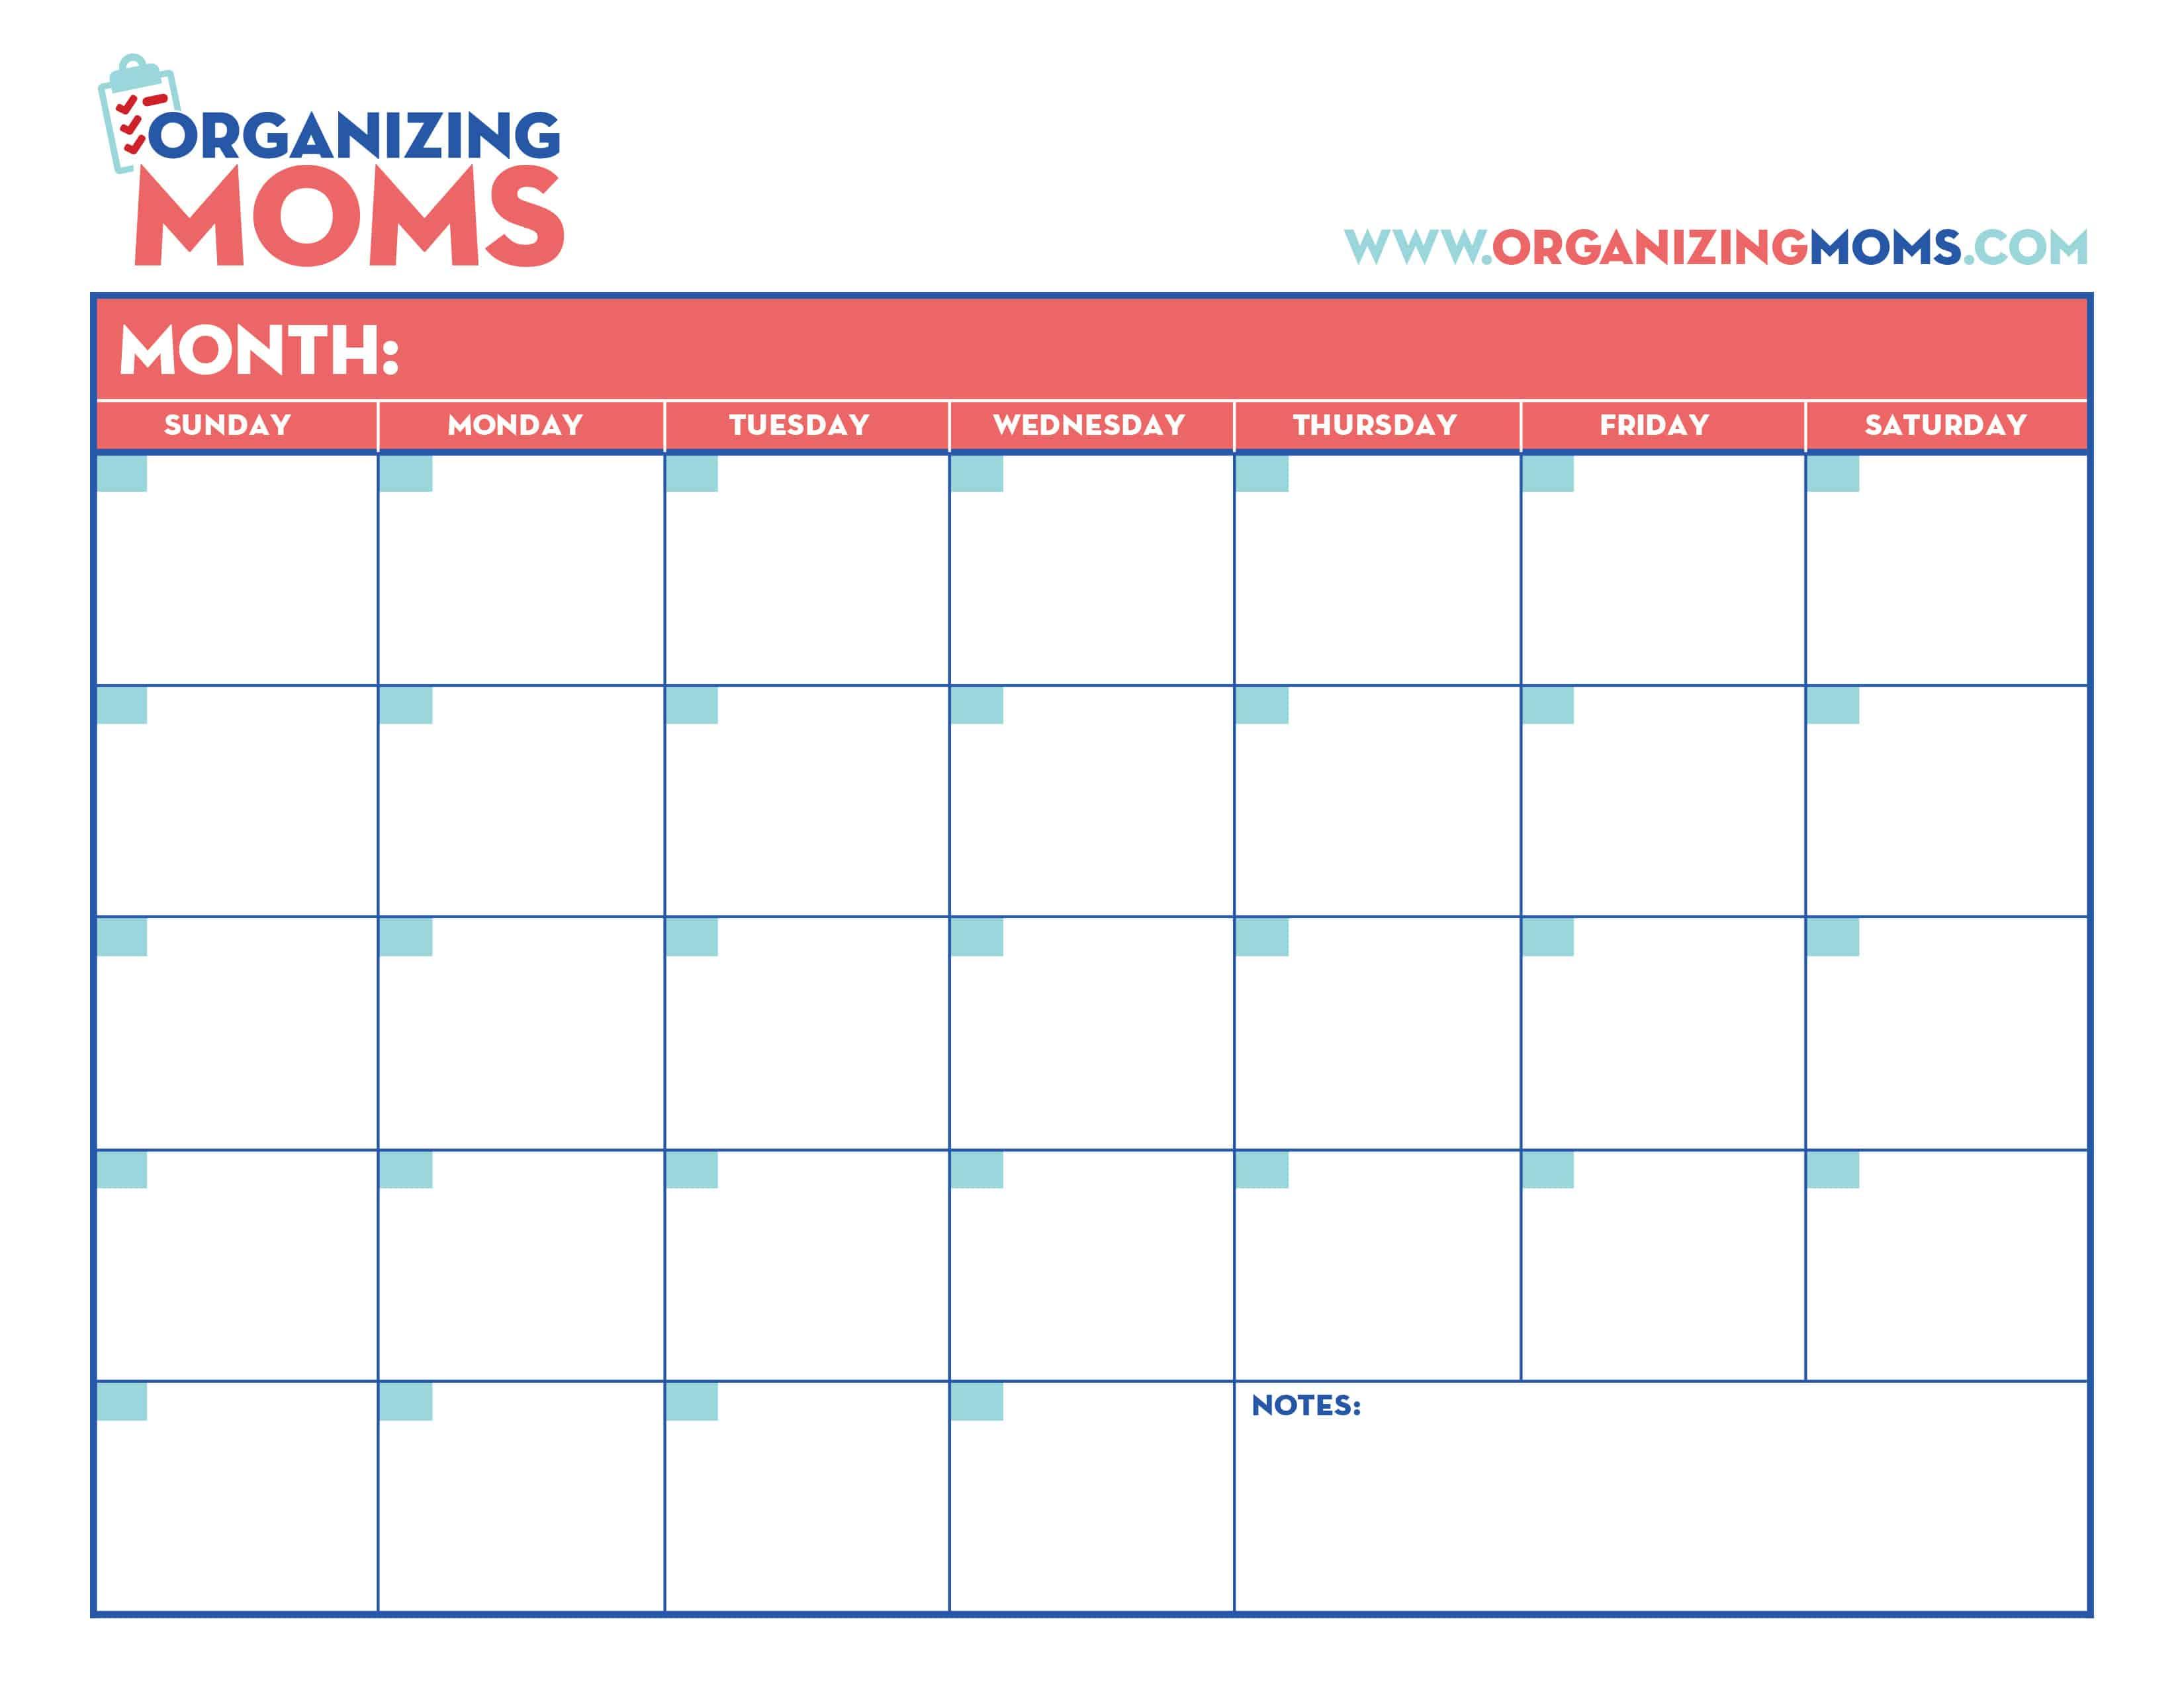 Organization Calendar For Moms : Customizable calendar free printable from organizing moms